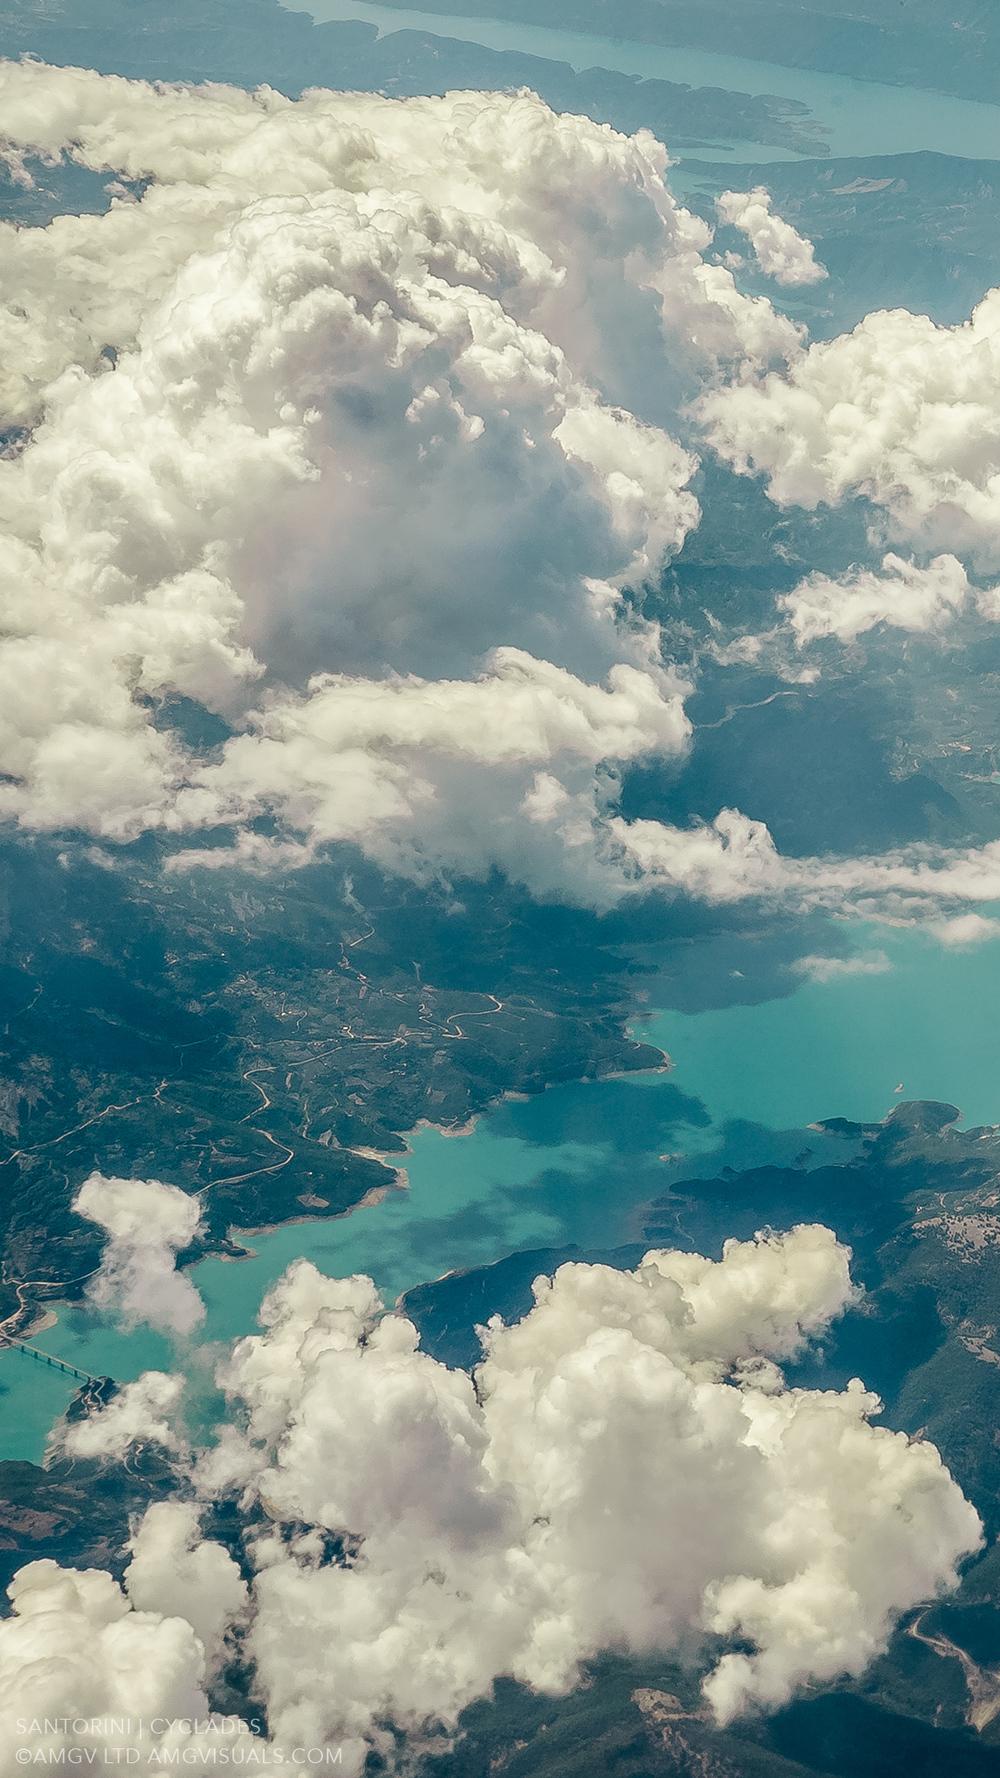 ©AMGV-LTD-Santorini+Cyclades-8.jpg